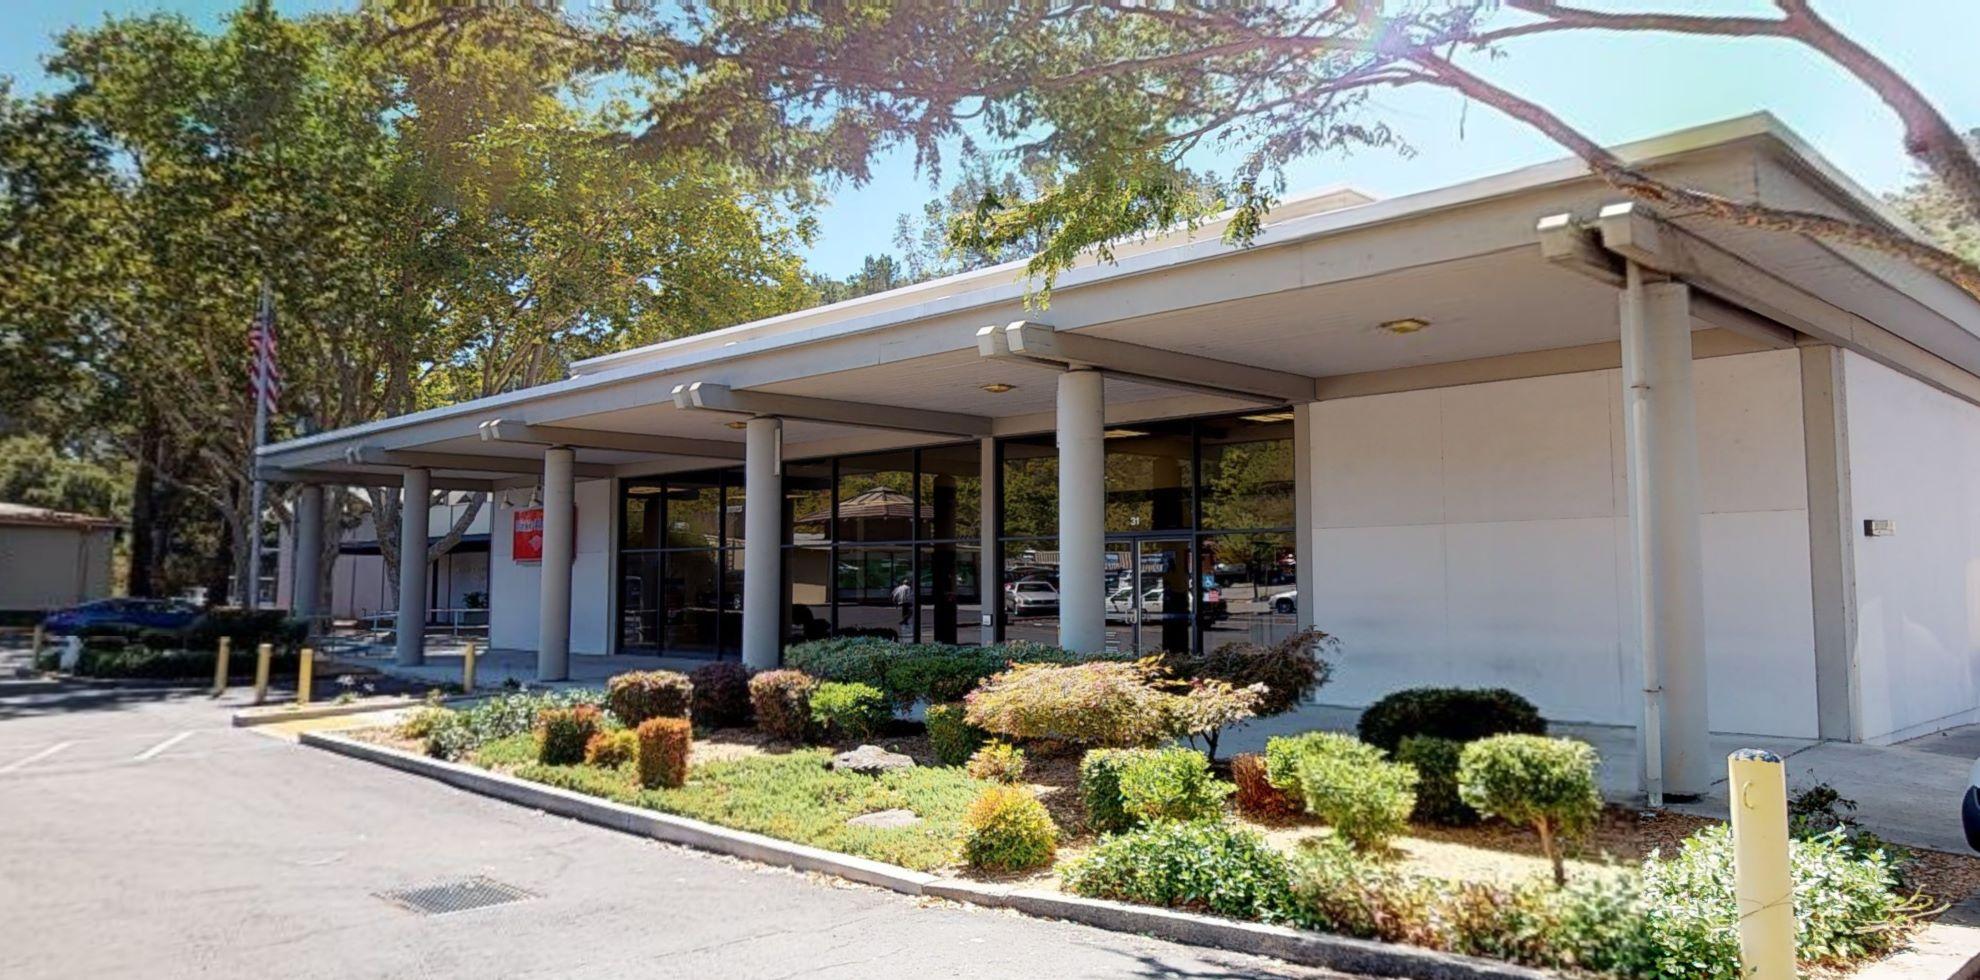 Bank of America financial center with walk-up ATM   31 Orinda Way, Orinda, CA 94563